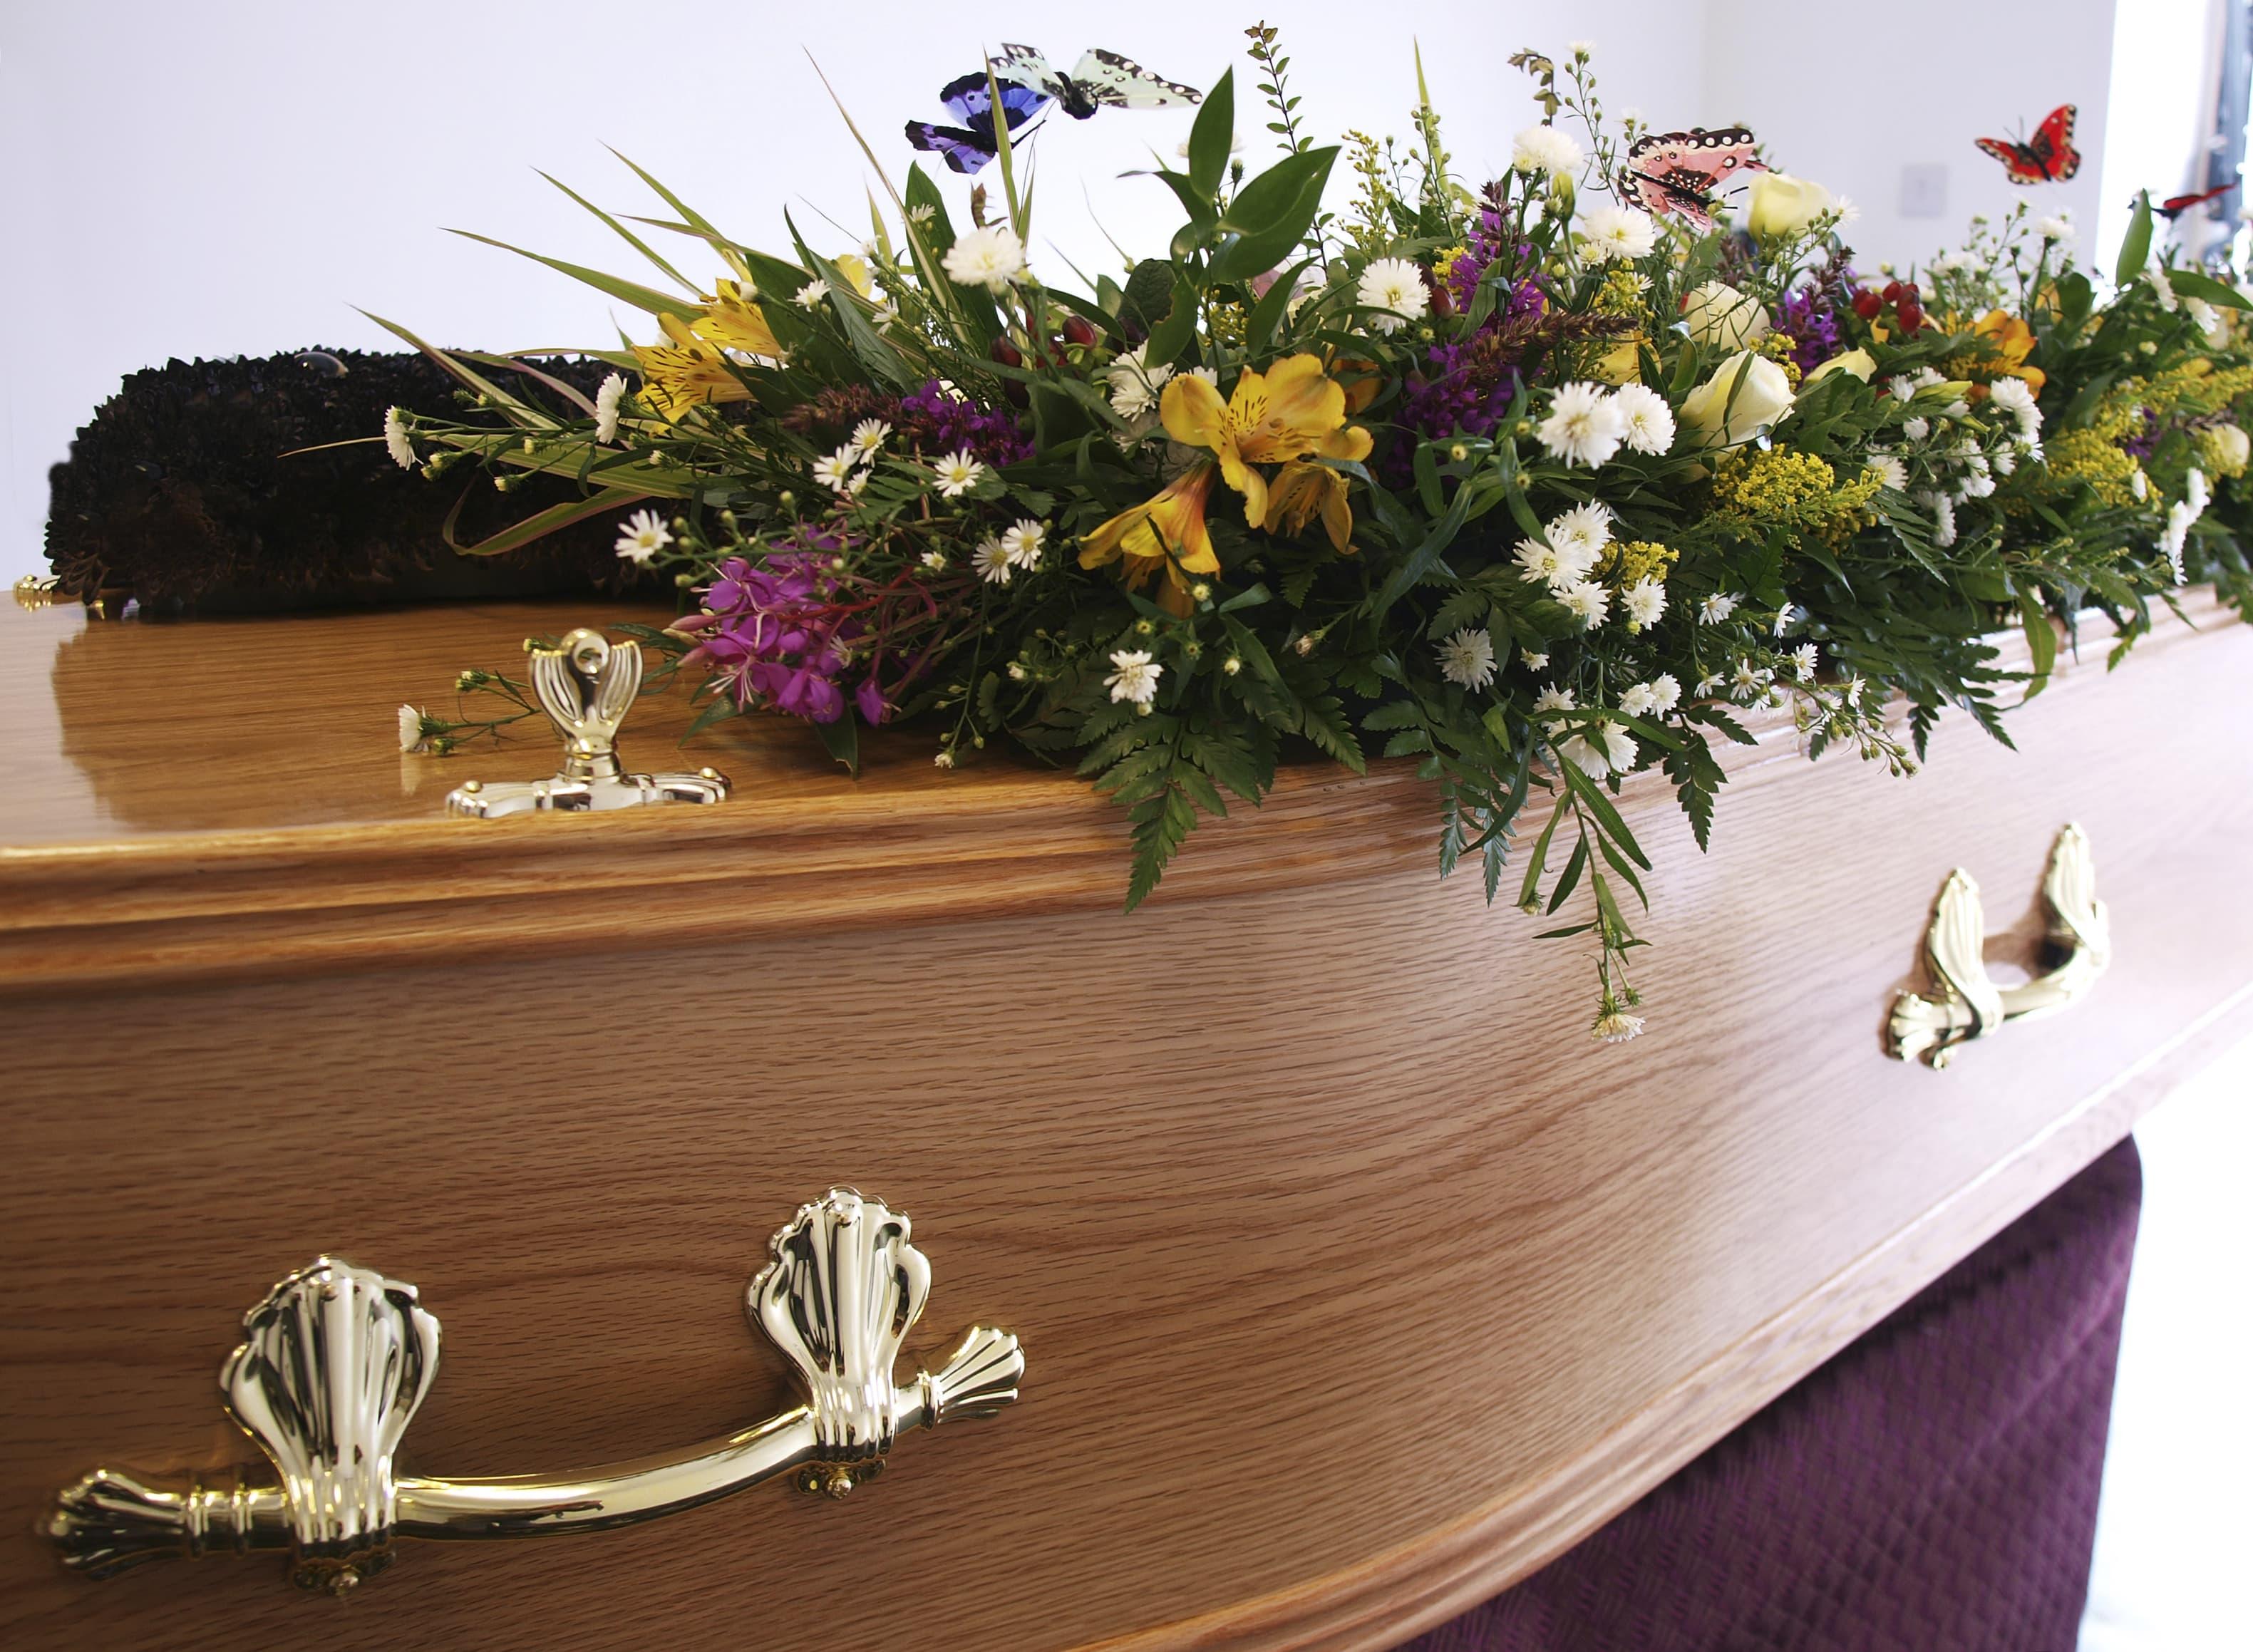 Plan your own funeral to avoid overspending izmirmasajfo